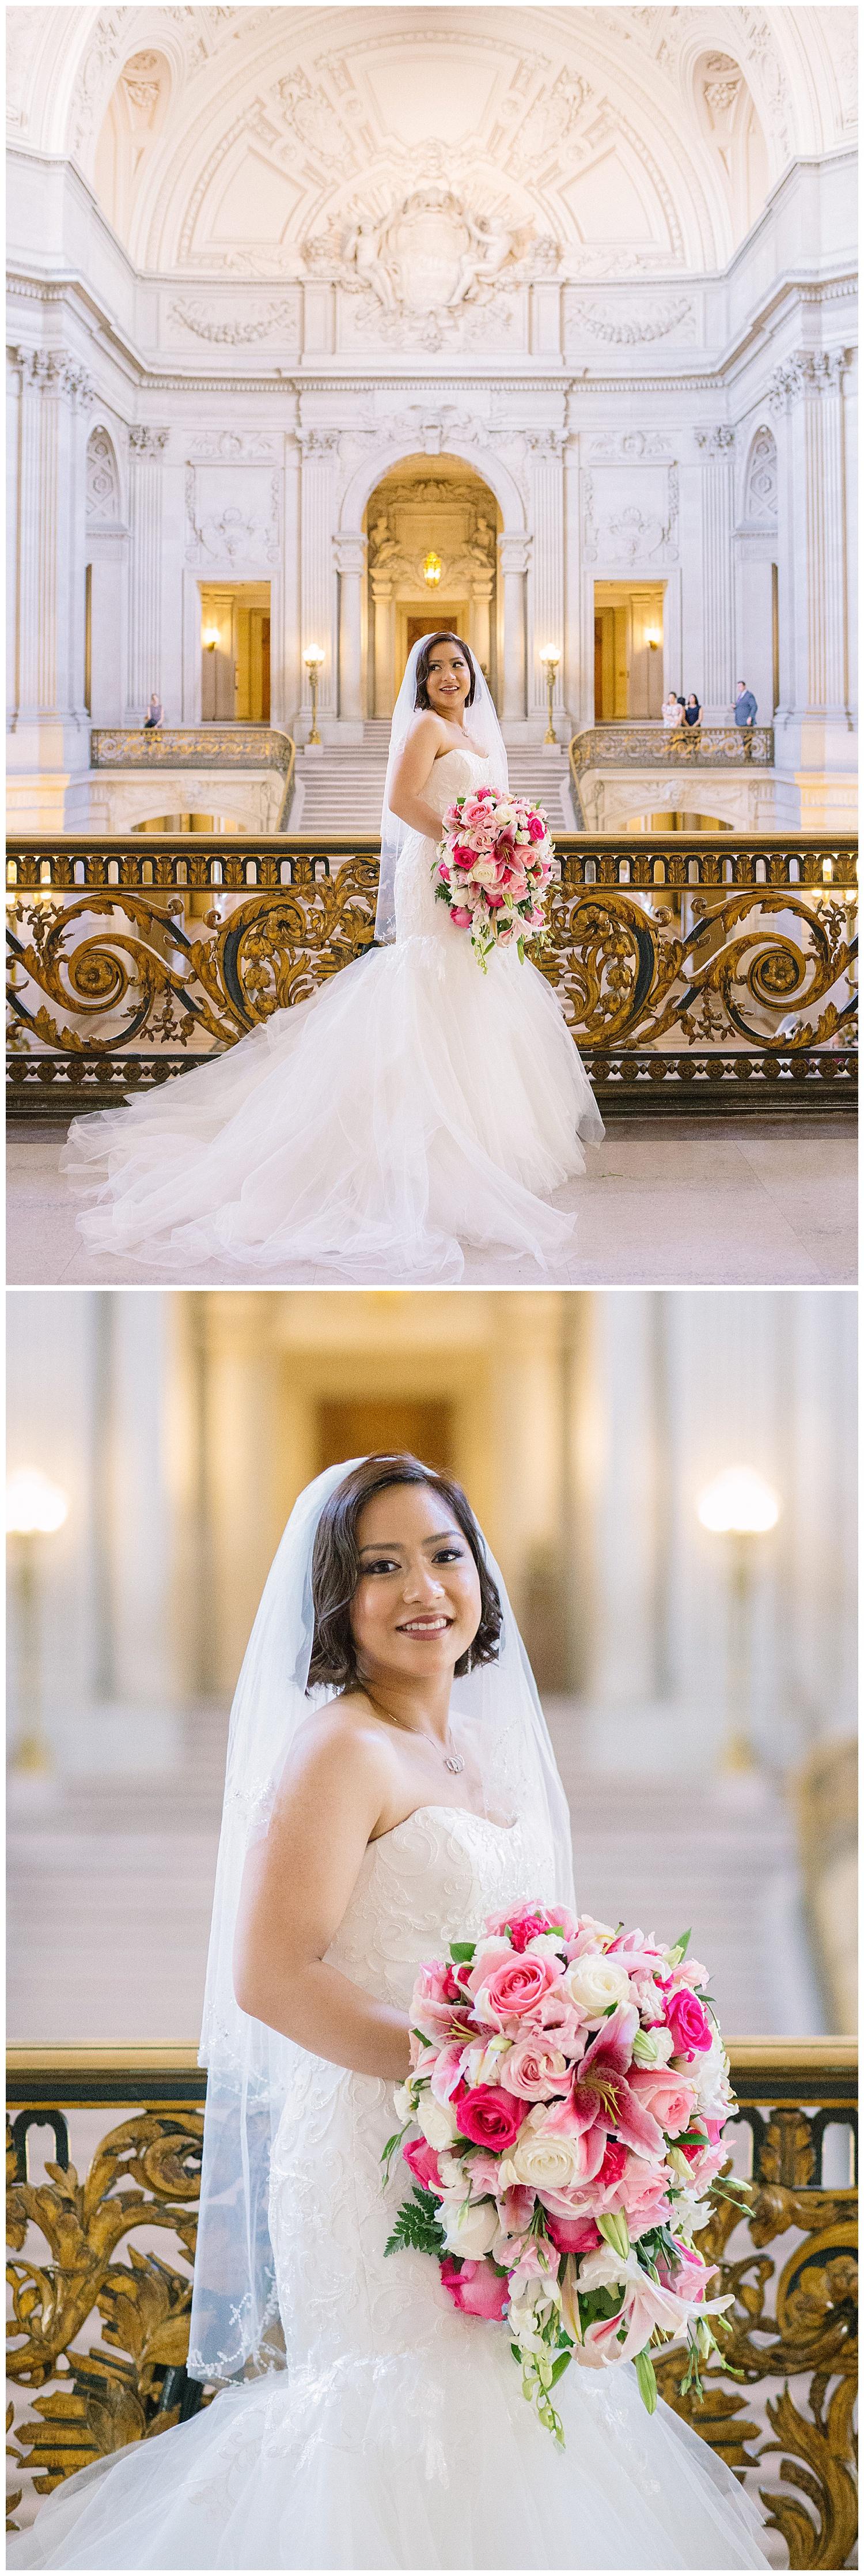 khariza-rae-photography-bay-area-wedding-photographer_0102.jpg